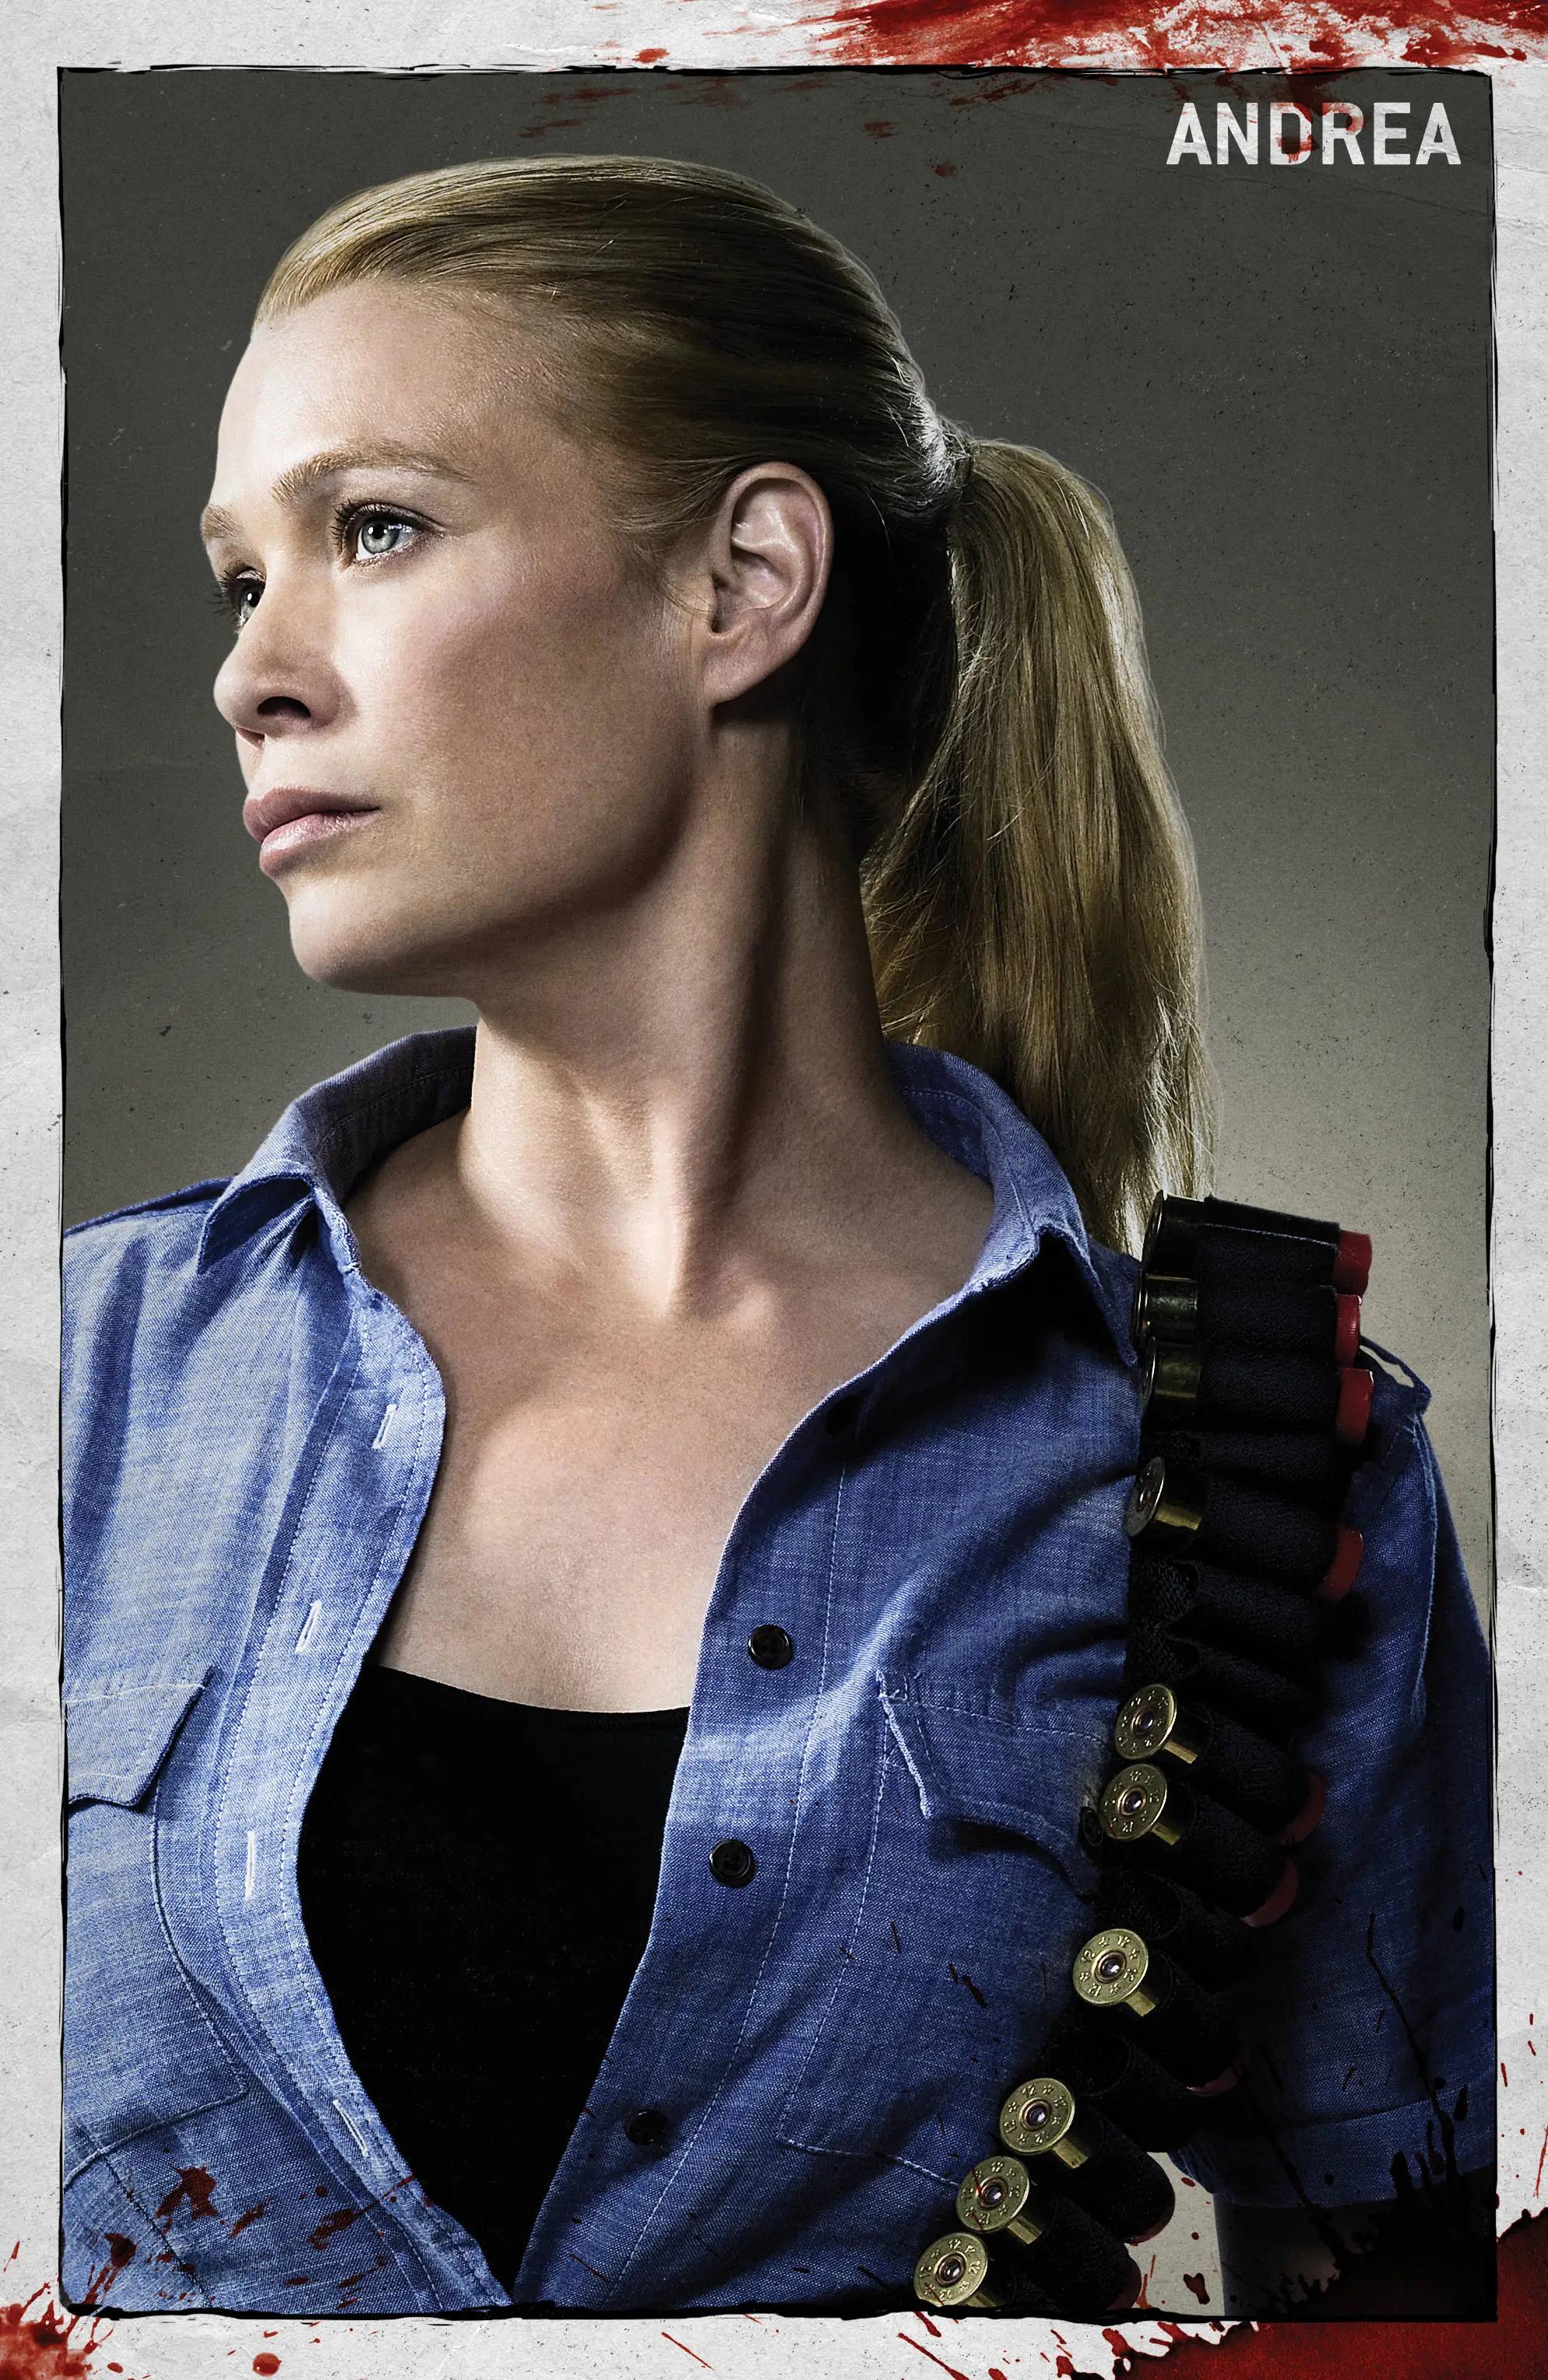 Andrea (TV Series)/Gallery